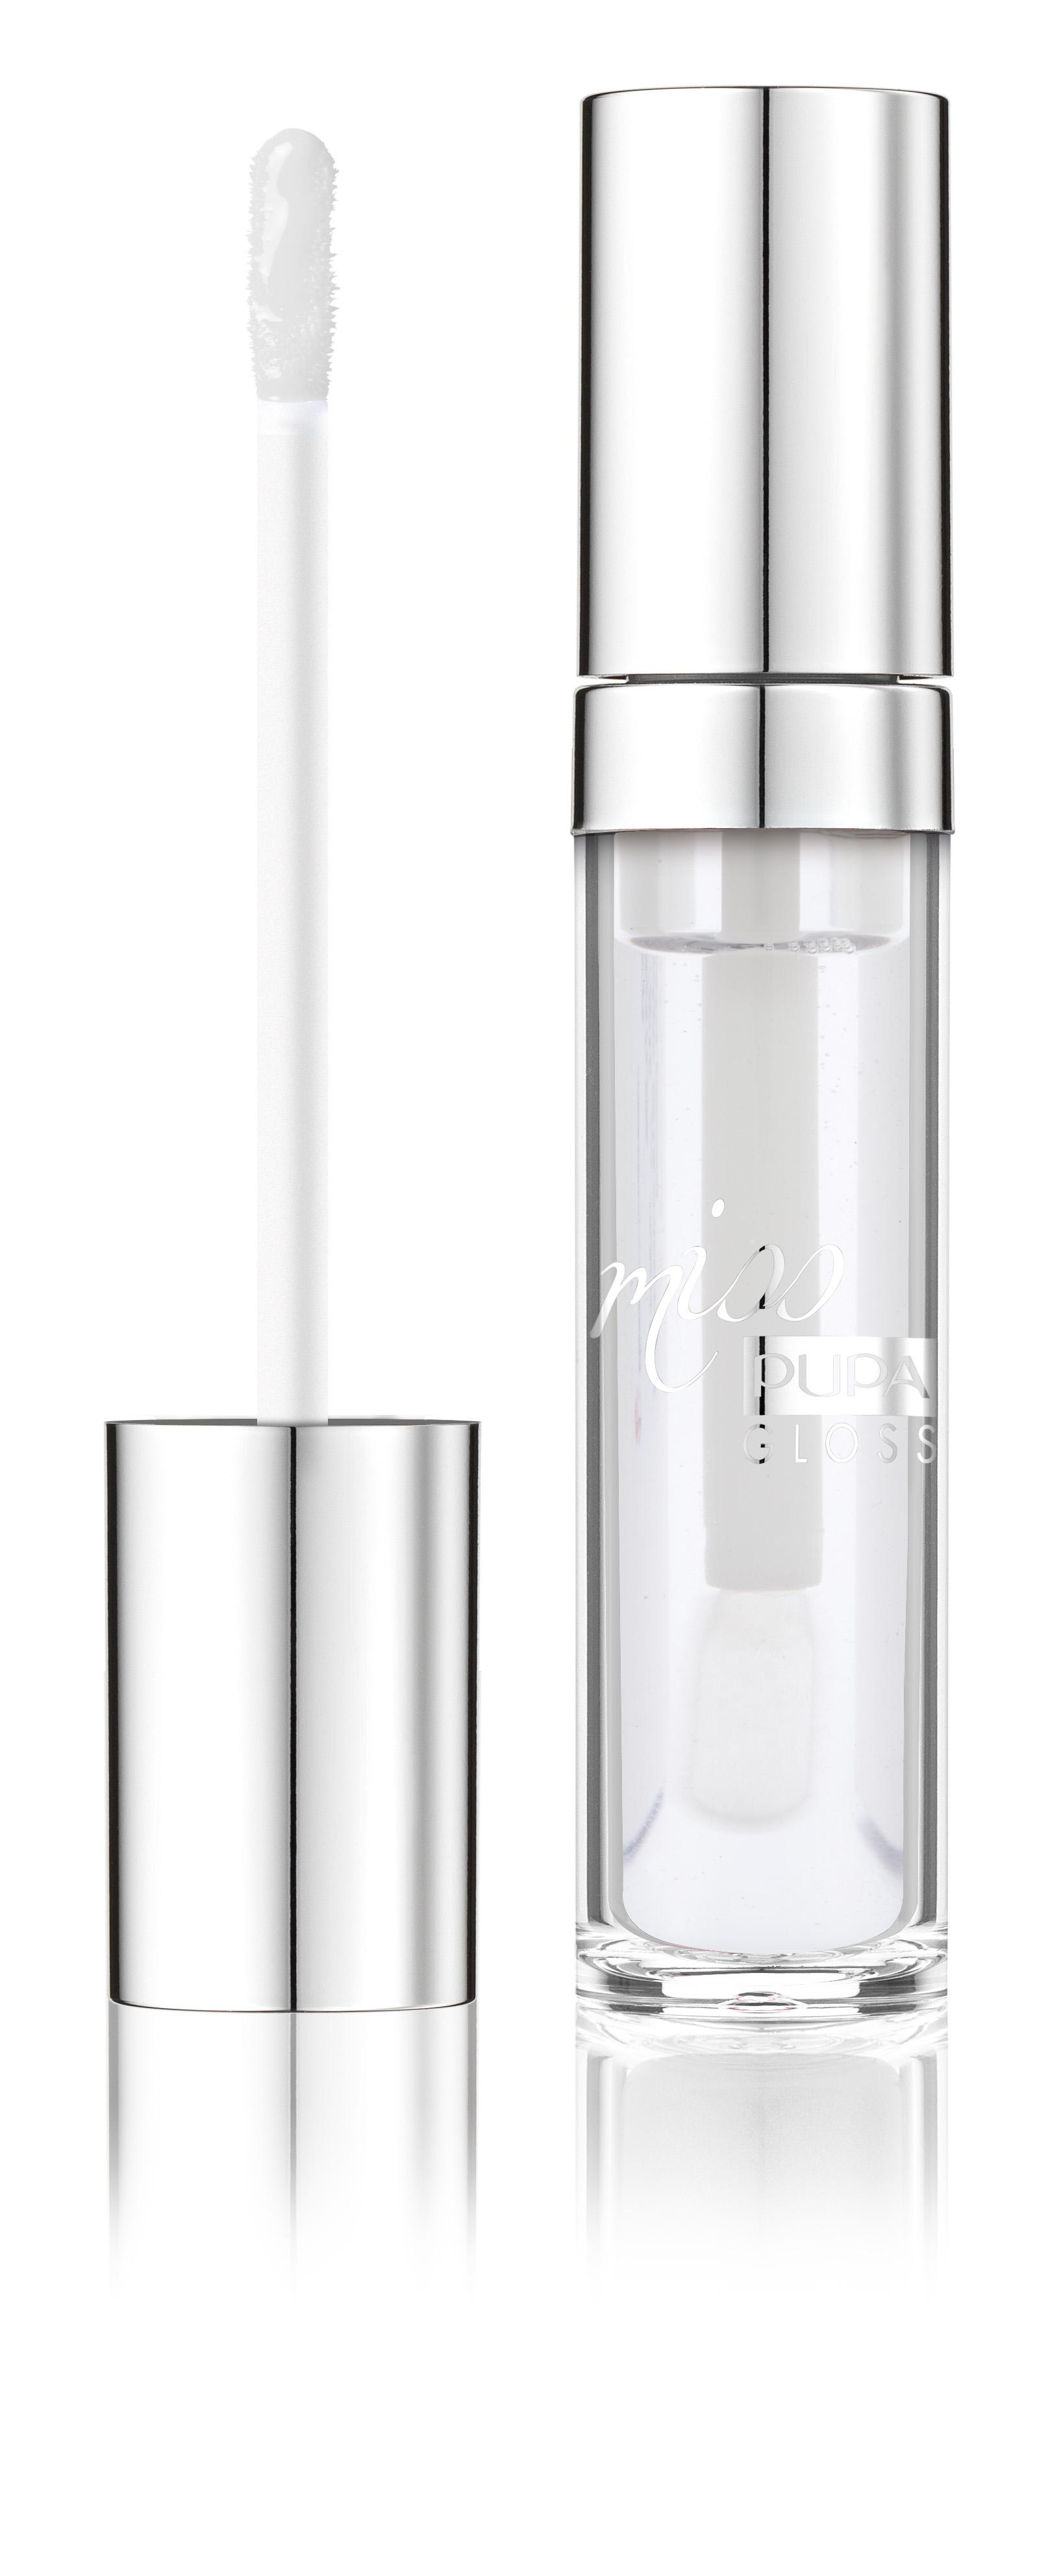 PUPA Блеск для губ, 100 Кристальный стеклянный / MISS PUPA GLOSS 5 мл